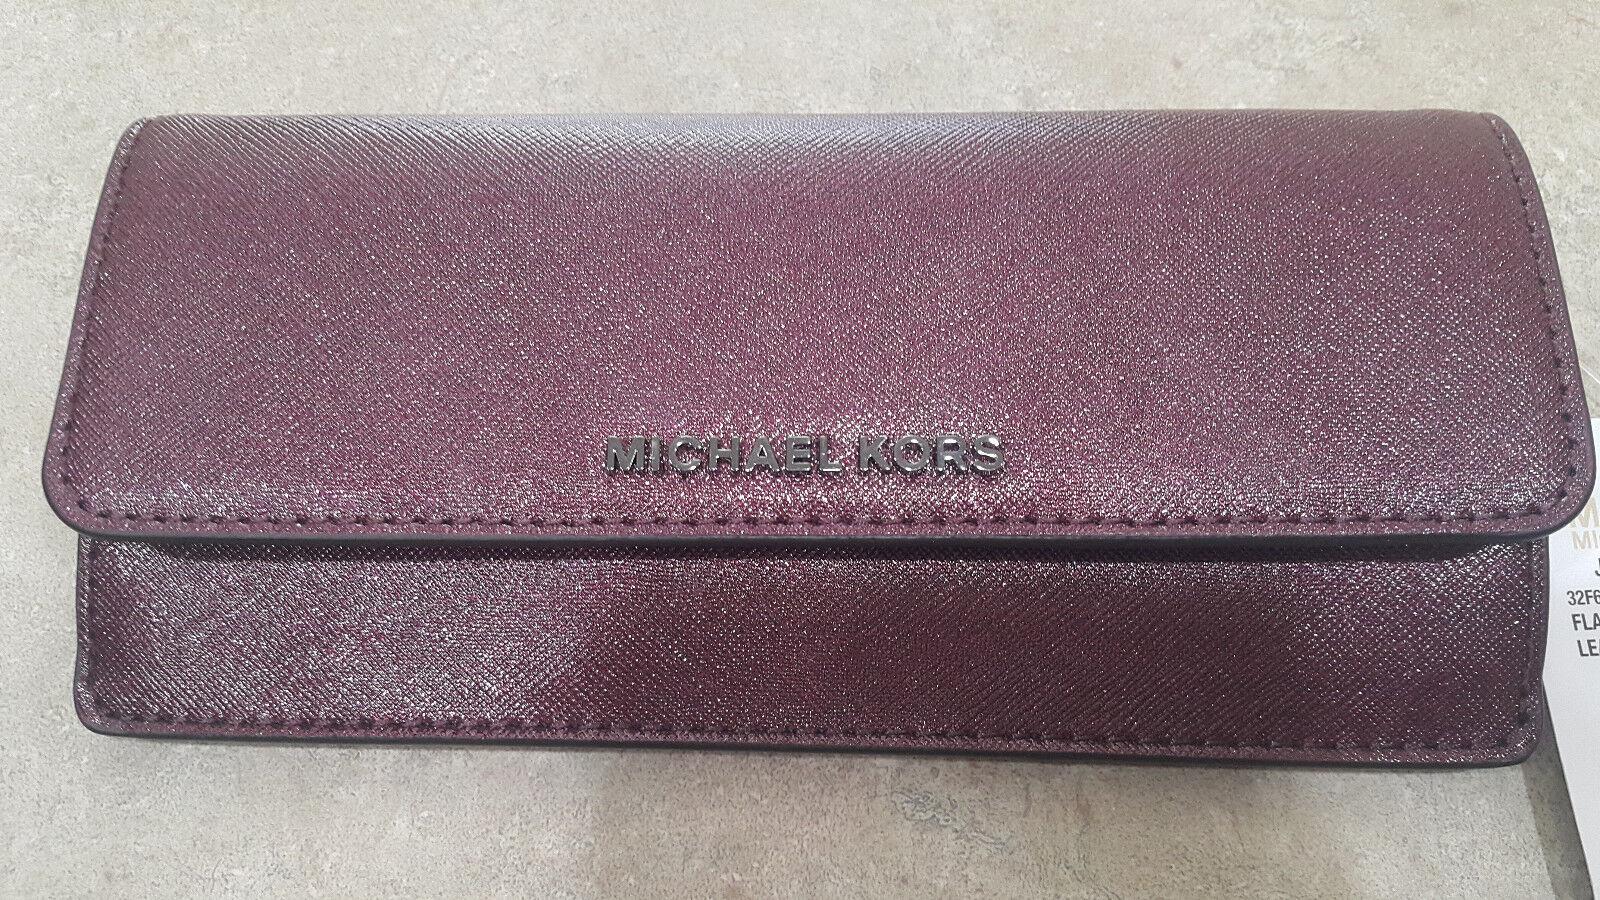 ab841d695249 Michael Kors Jet Set Travel Plum Leather Flat Envelope Wallet ...